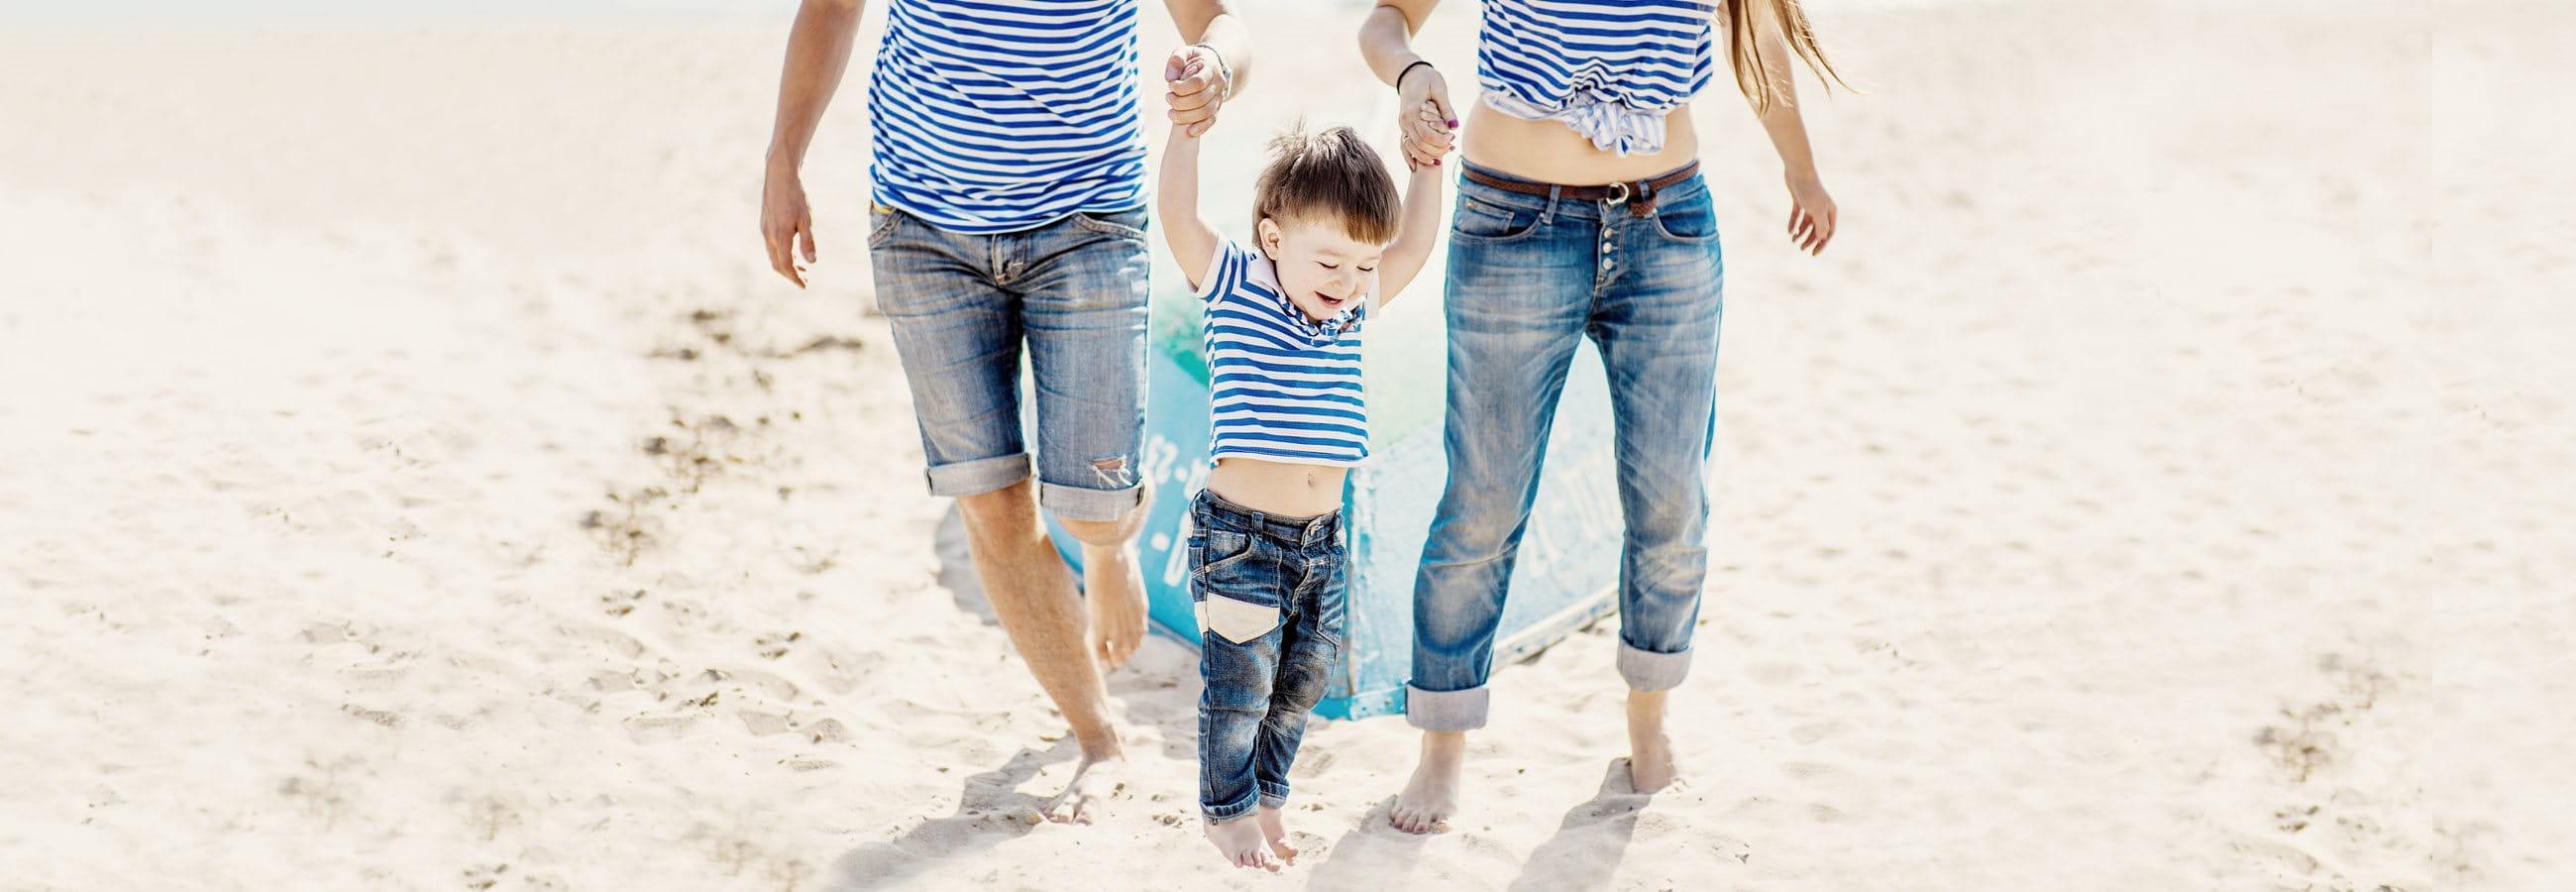 Fröhliche Familie am Strand